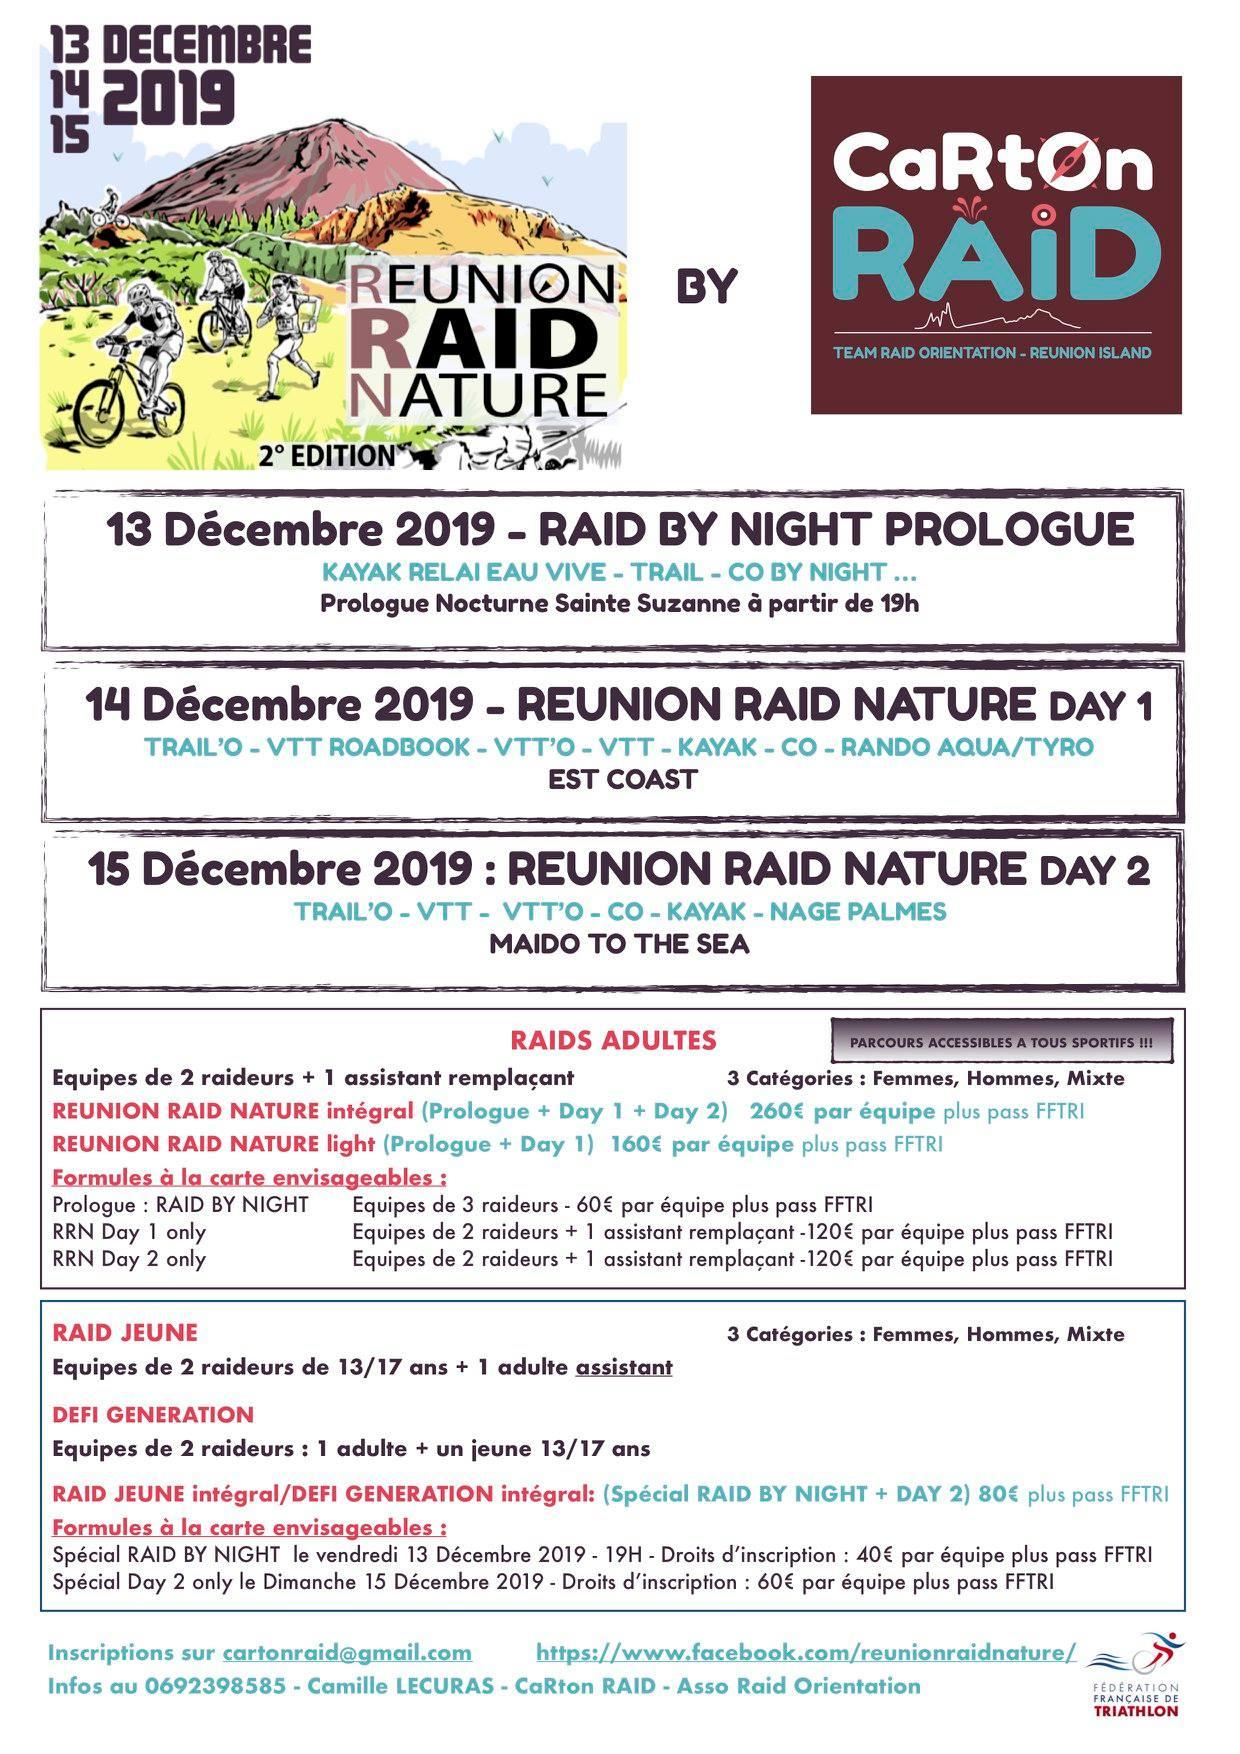 Calendrier Raid Multisport 2019.Reunion Raid Nature 2019 Trail Pei